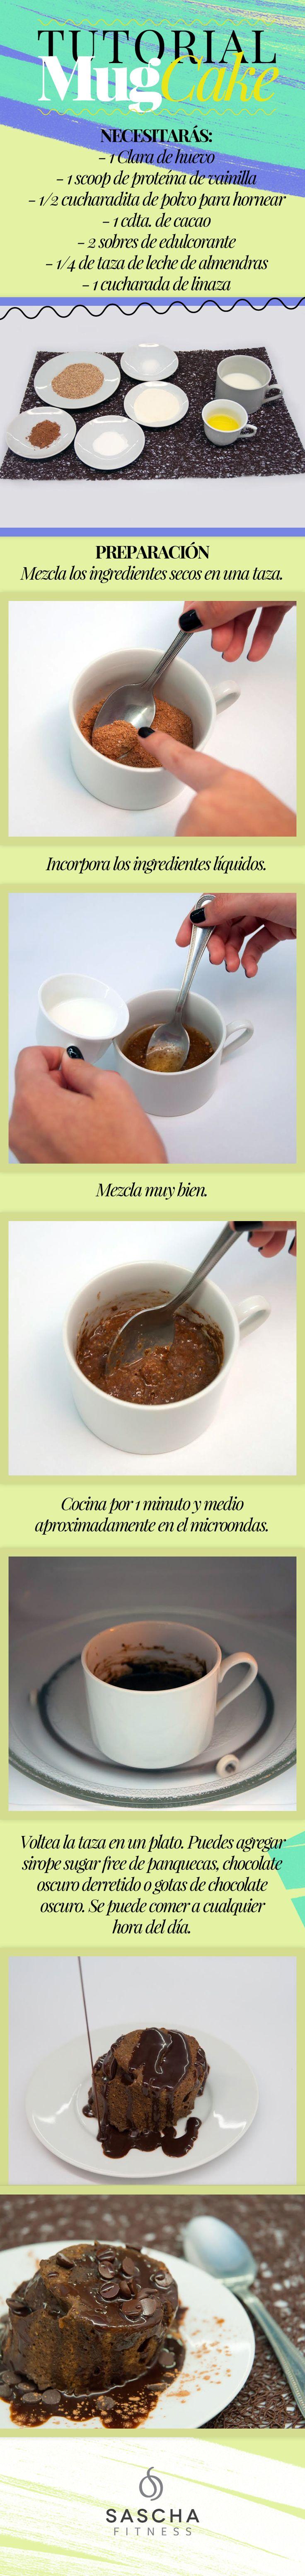 http://www.cornergp.com/tienda?bus=mug MUG CAKE